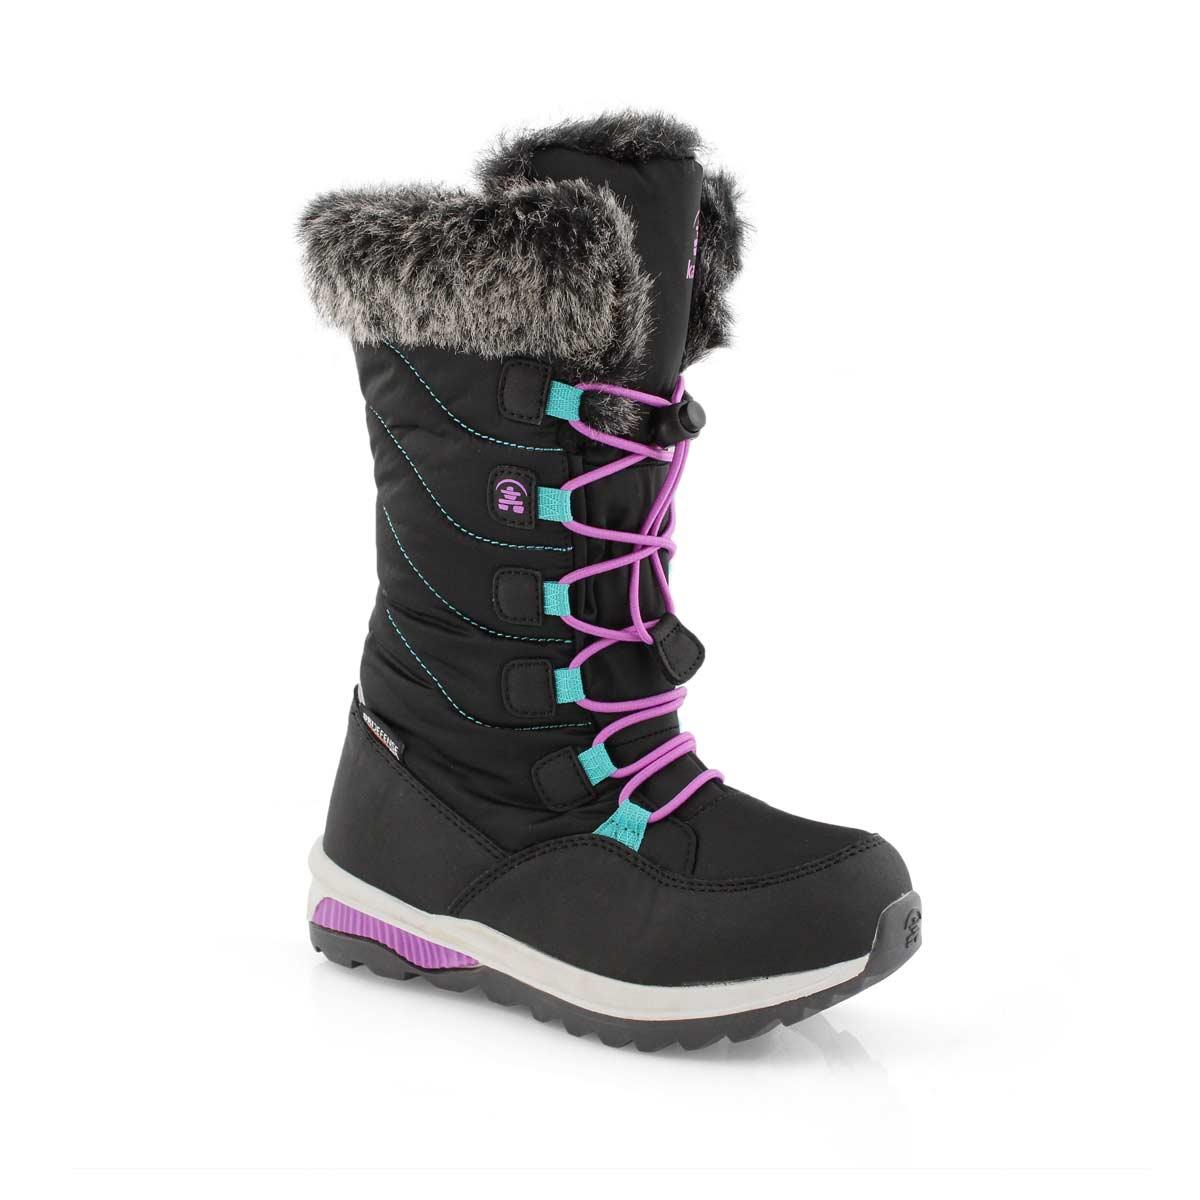 Grls Prairie black wtpf winter boot